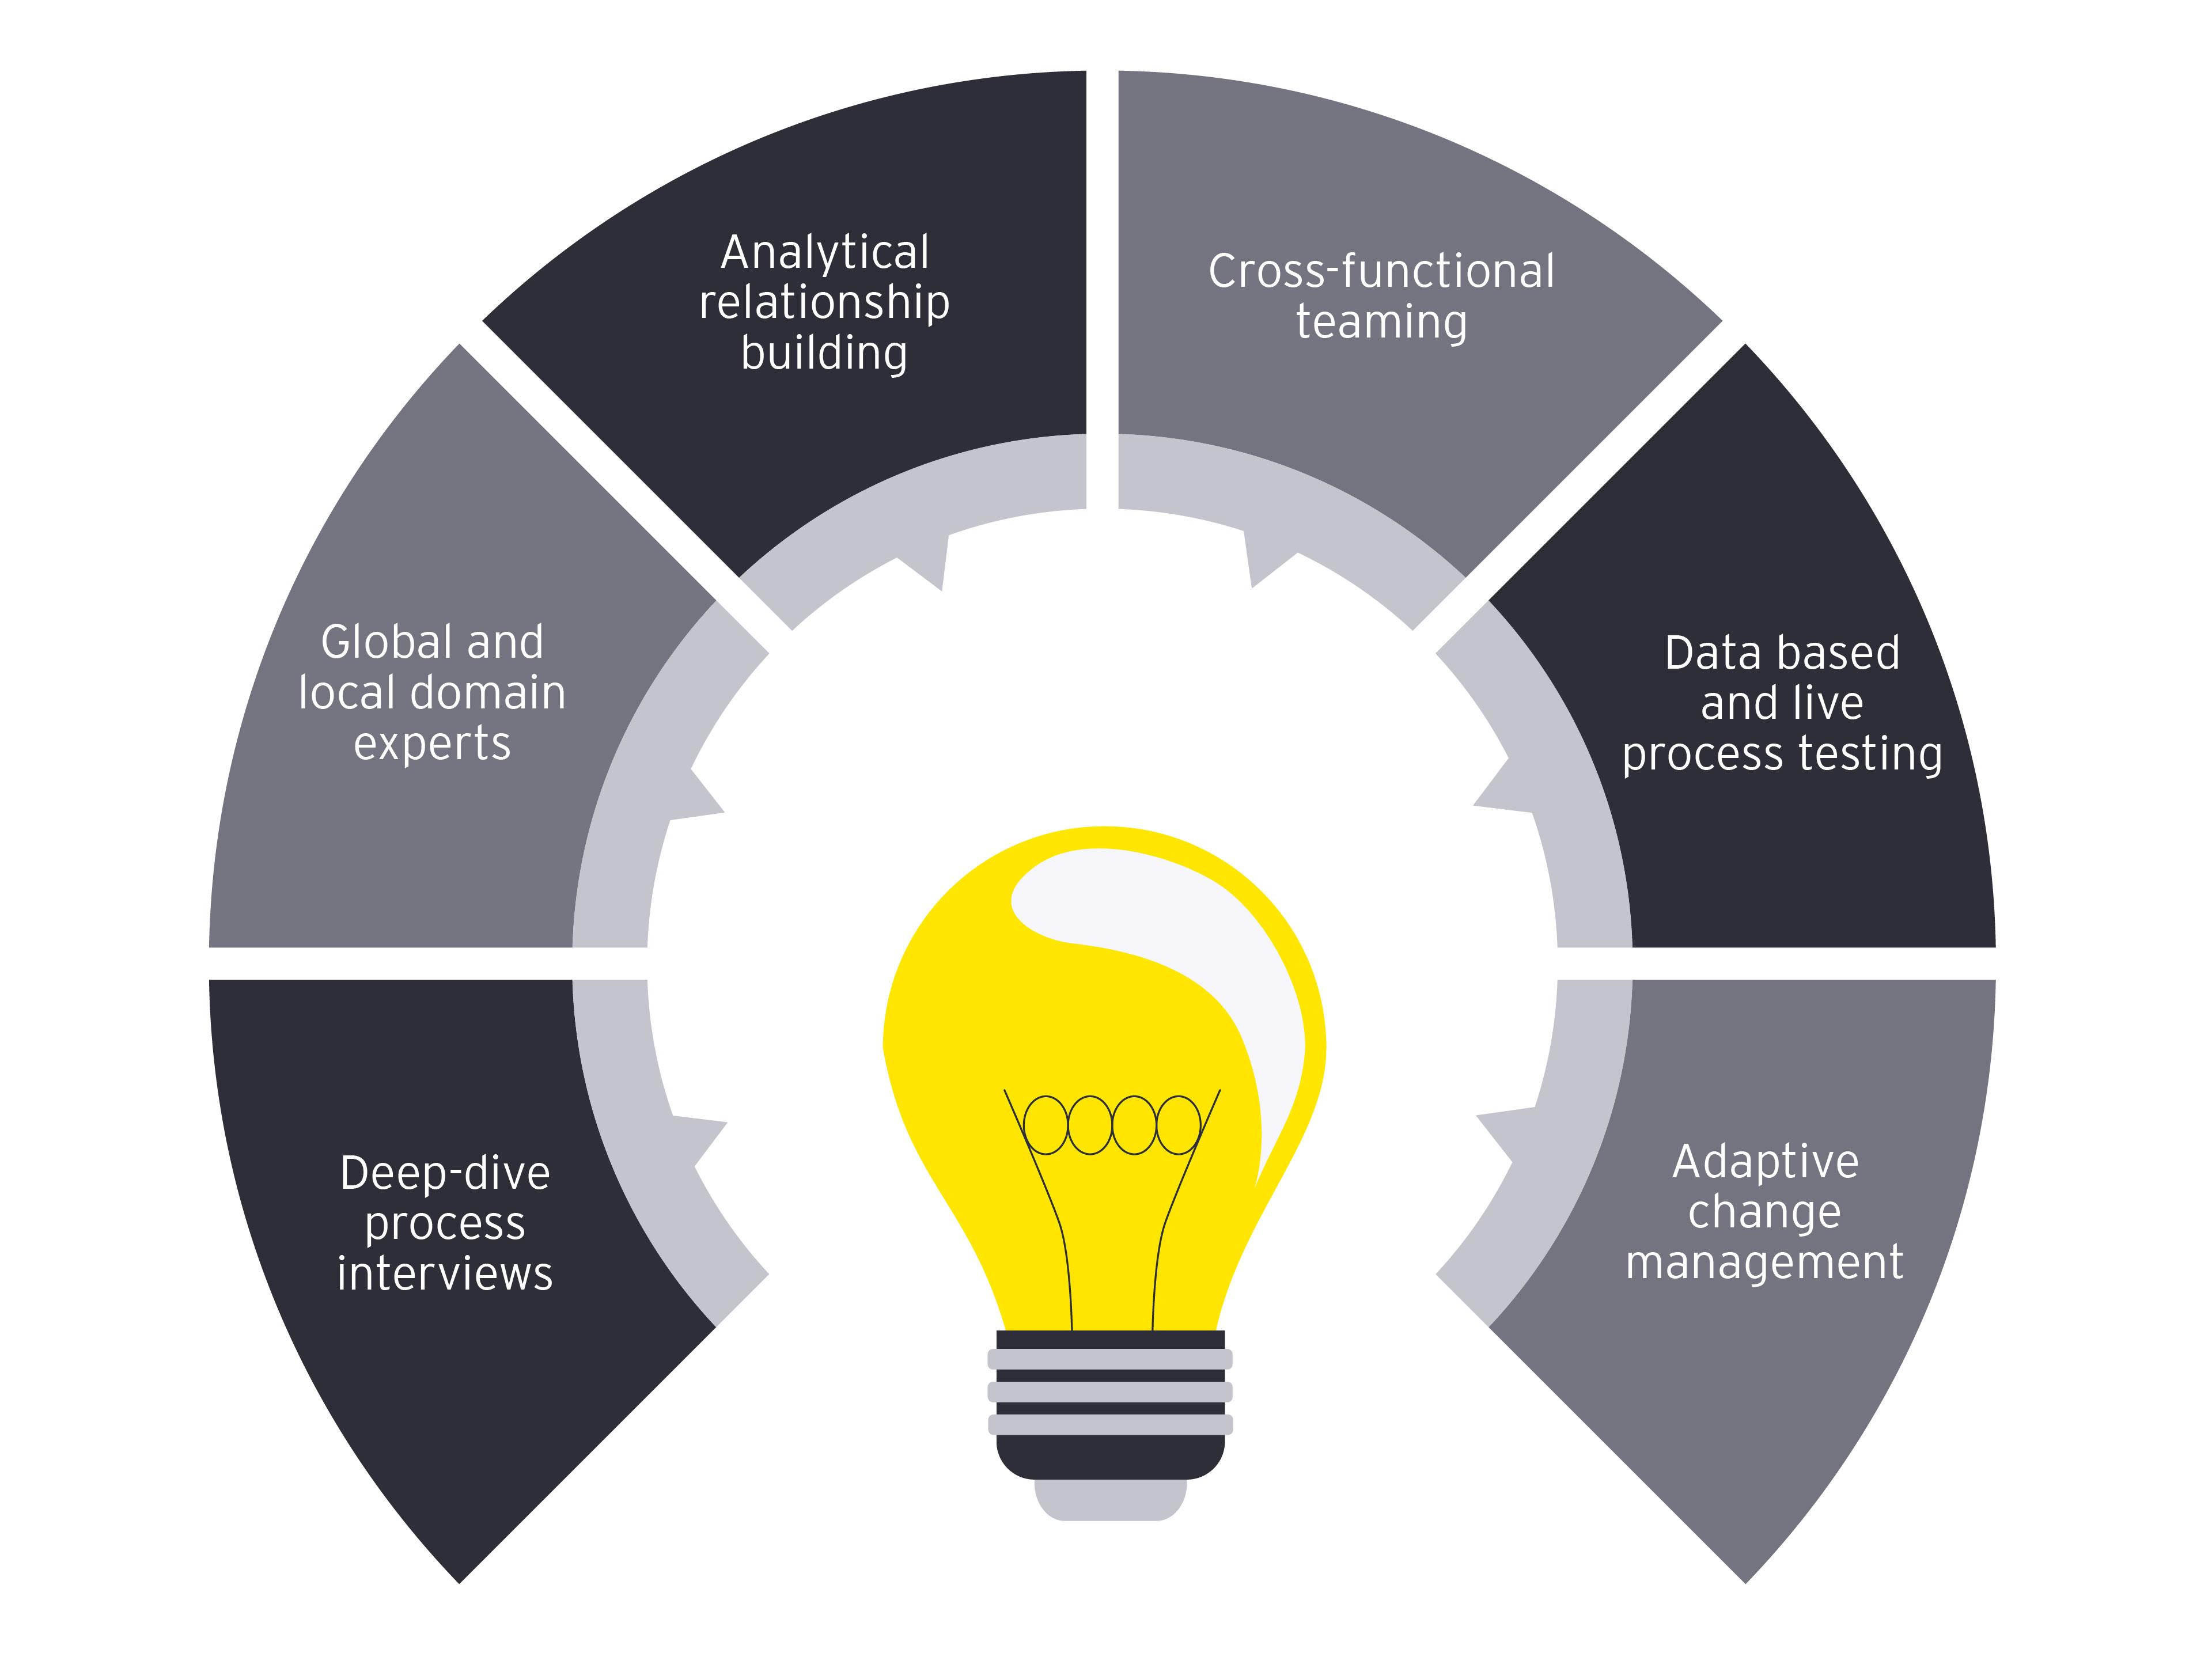 Digital business transformation solutions